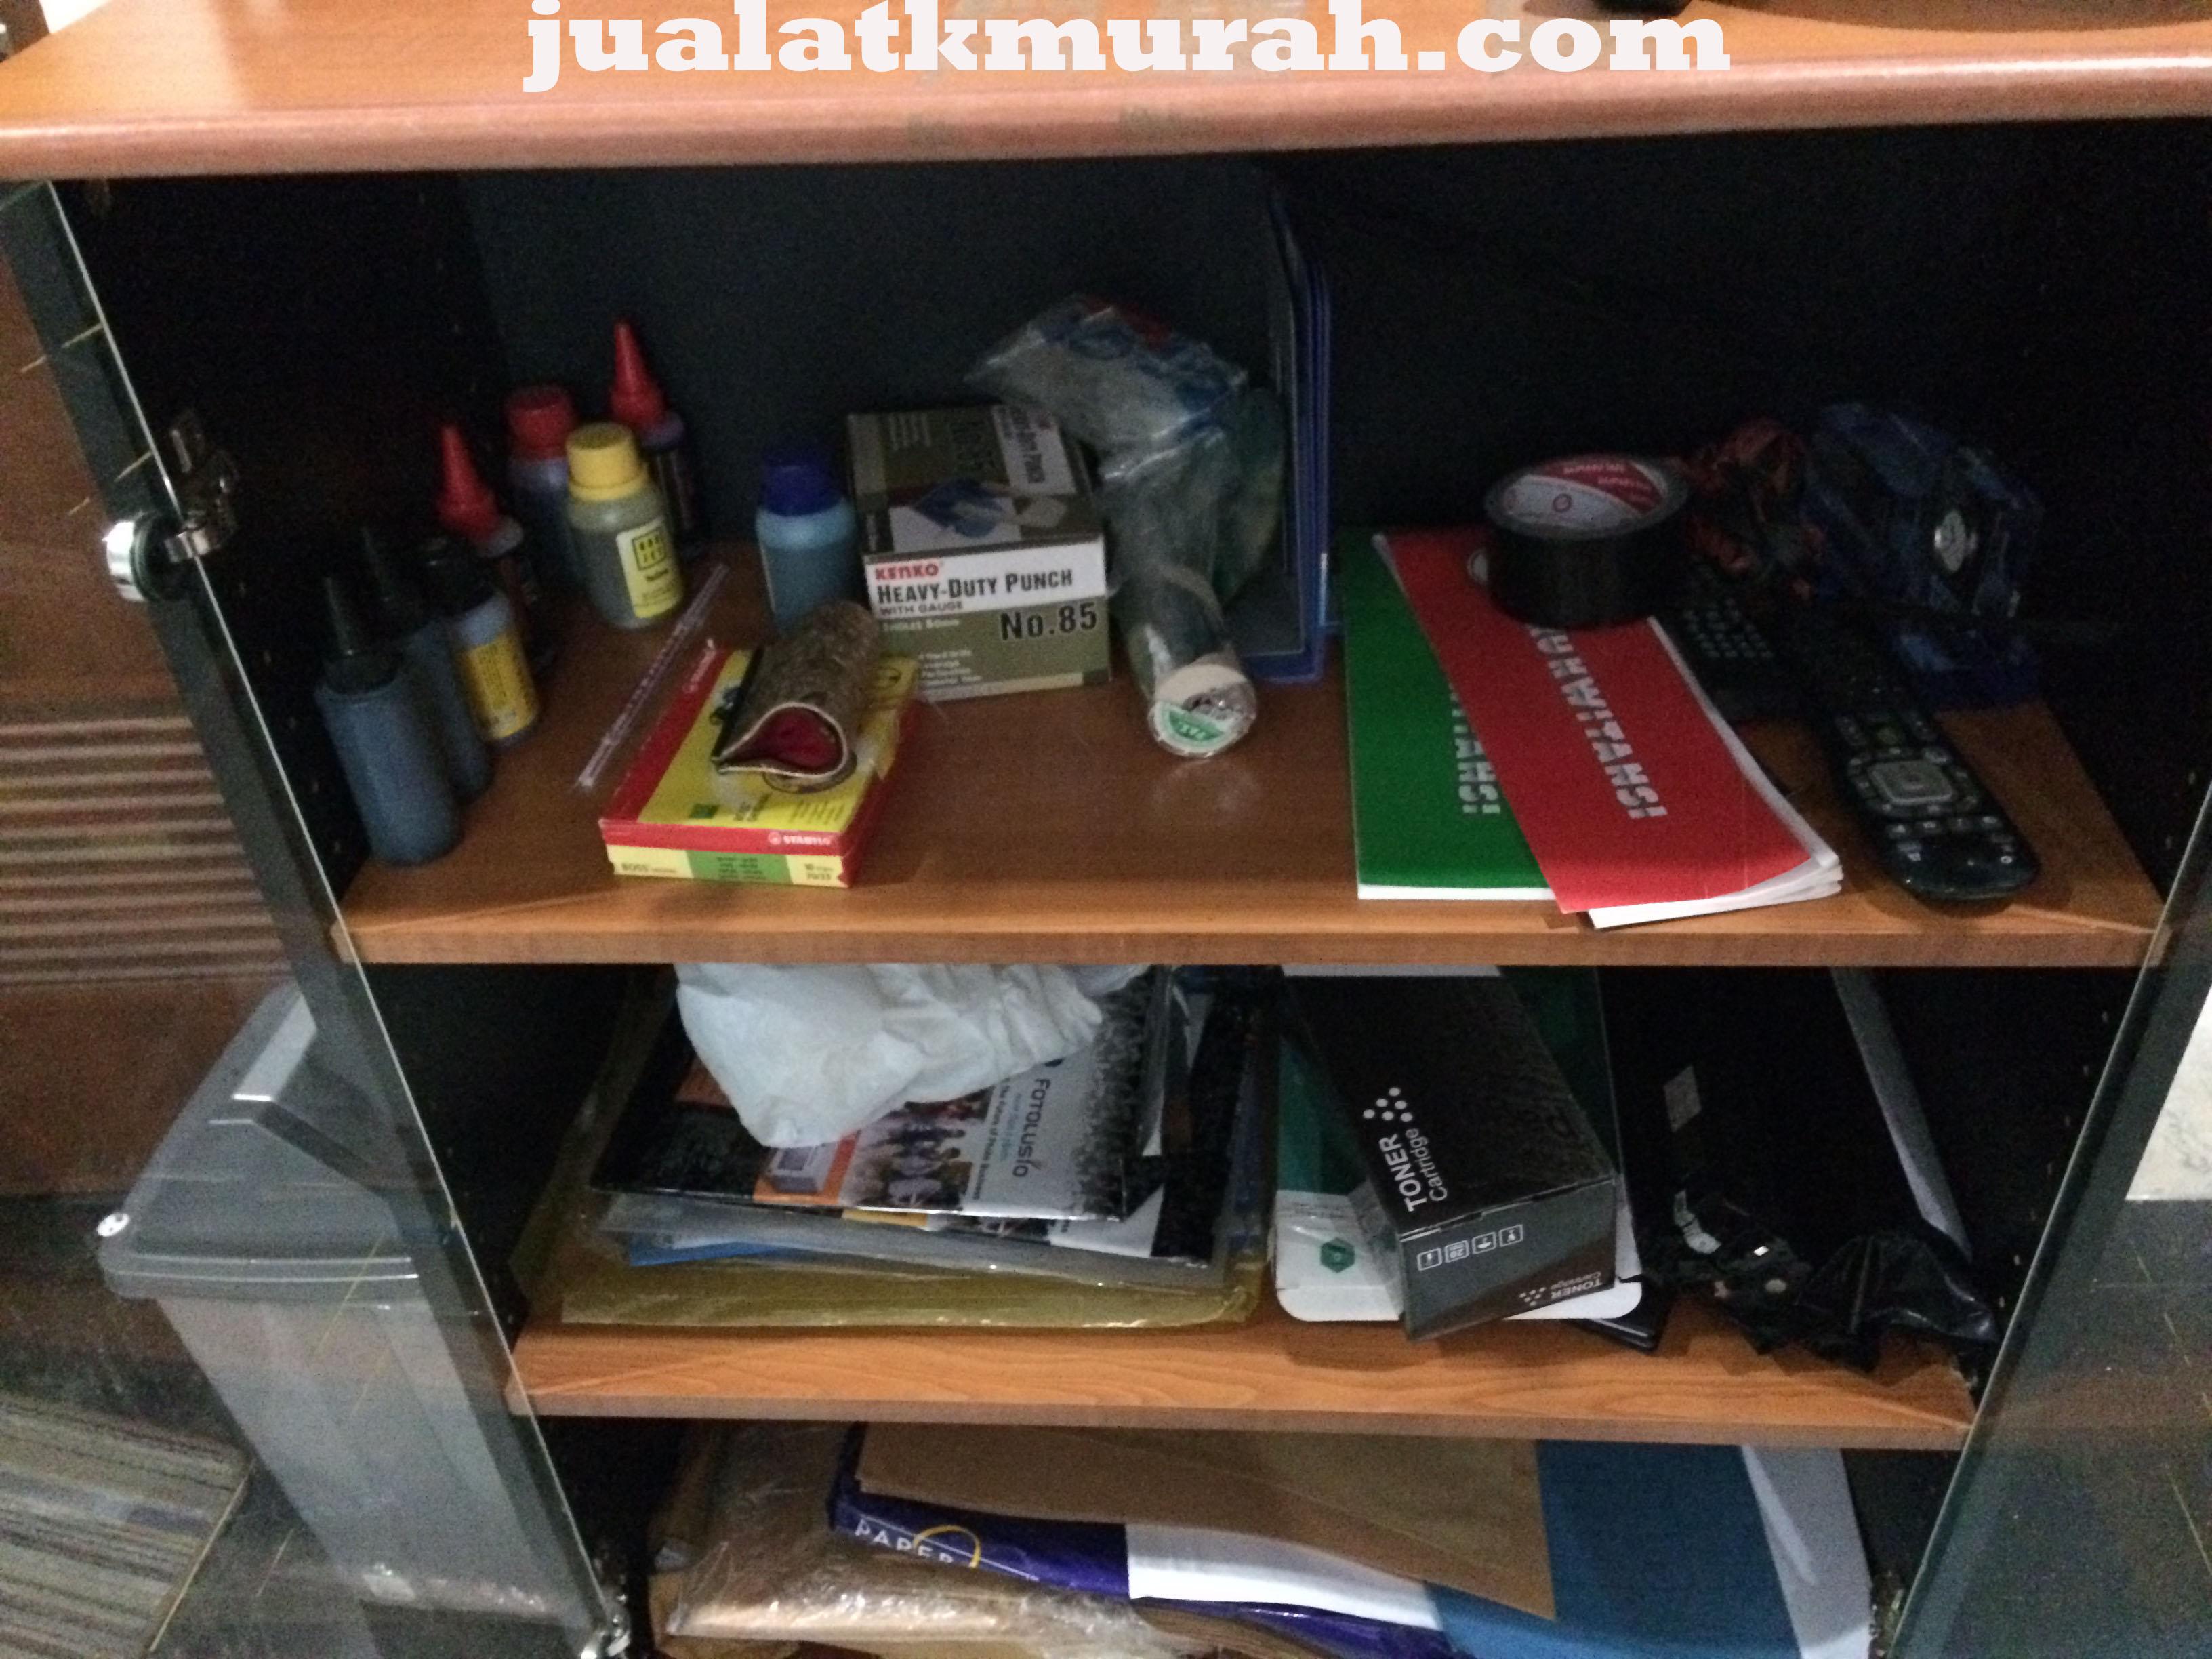 Jual ATK Murah MT Haryono Jakarta Selatan